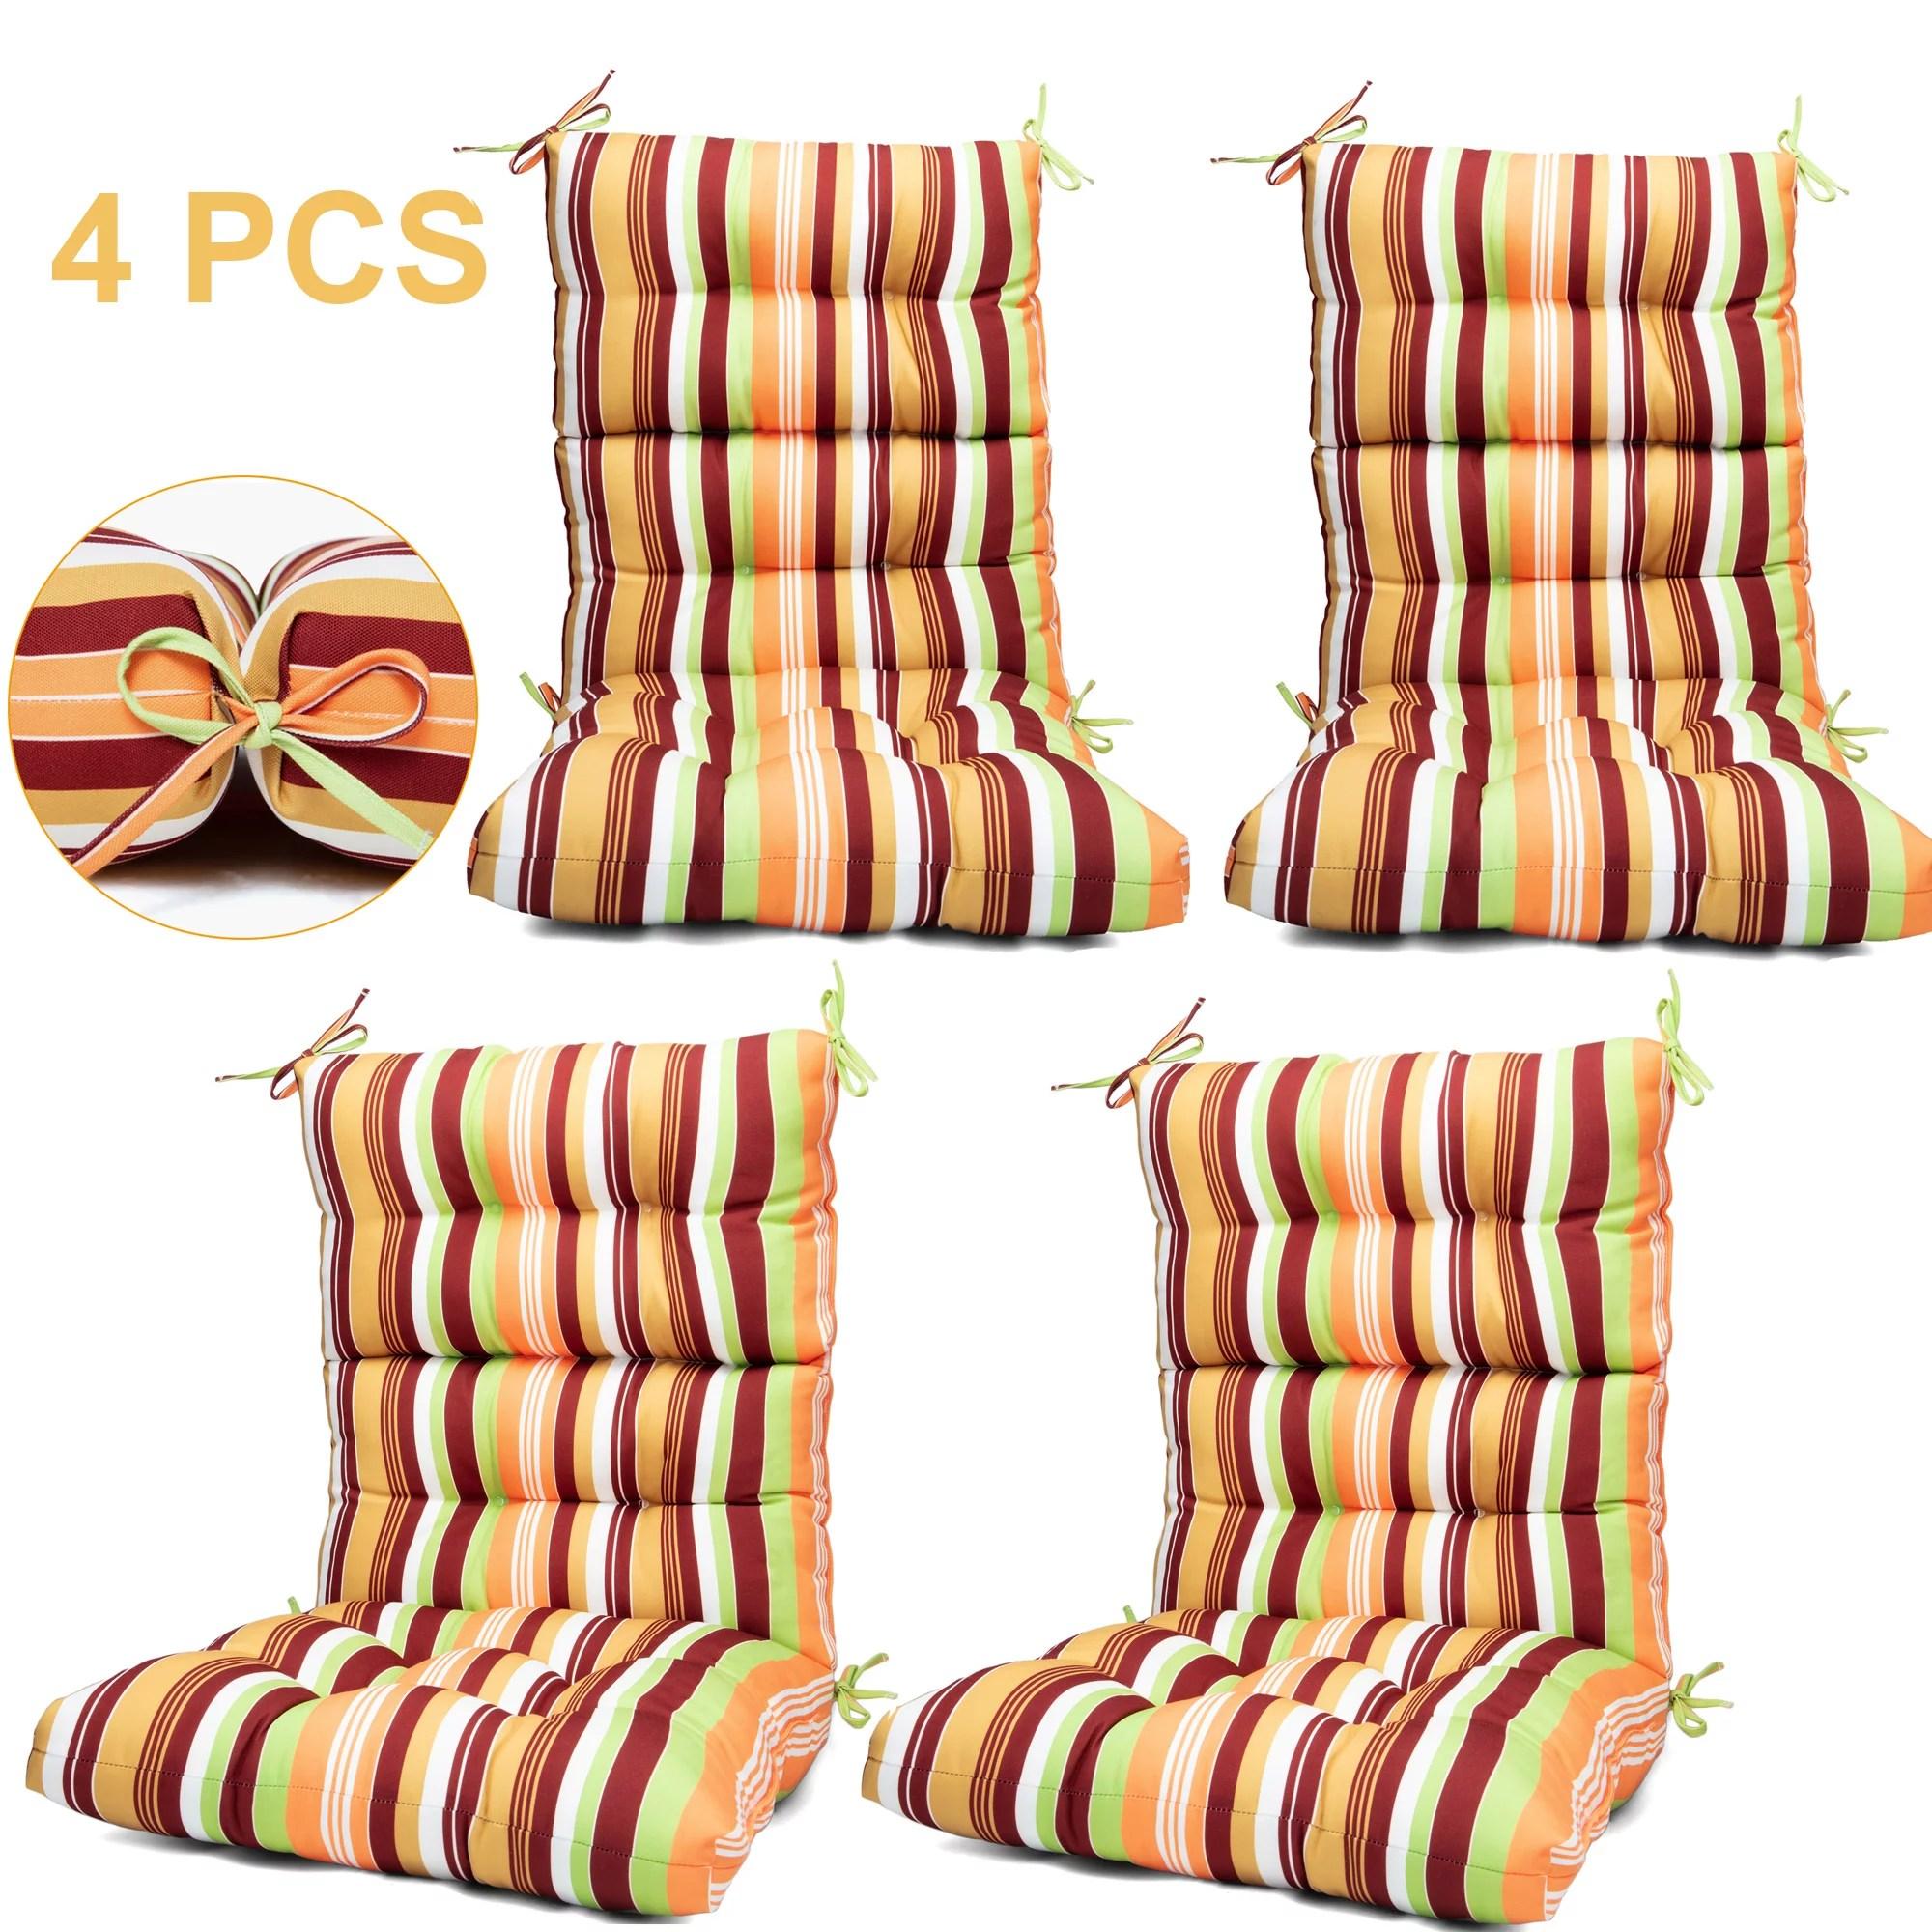 outdoor chair cushion dining solid chair cushion outdoor high back patio chair cushion high rebound foam chair cushions for patio garden decor 44x21